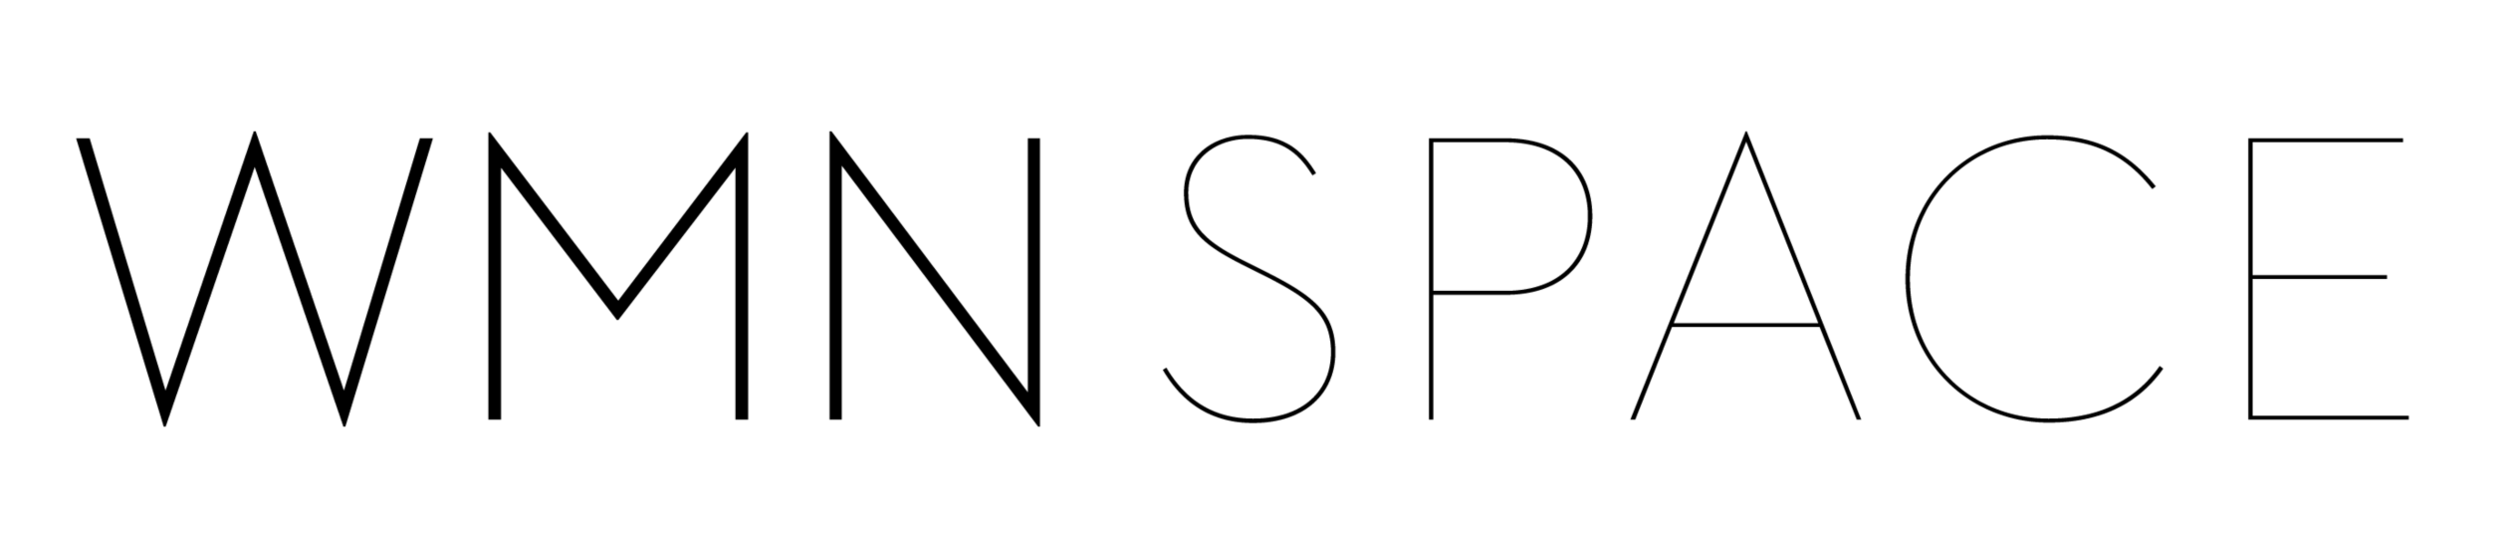 c.H.9b.e2e.WMN-LOGO_FINAL-01.png